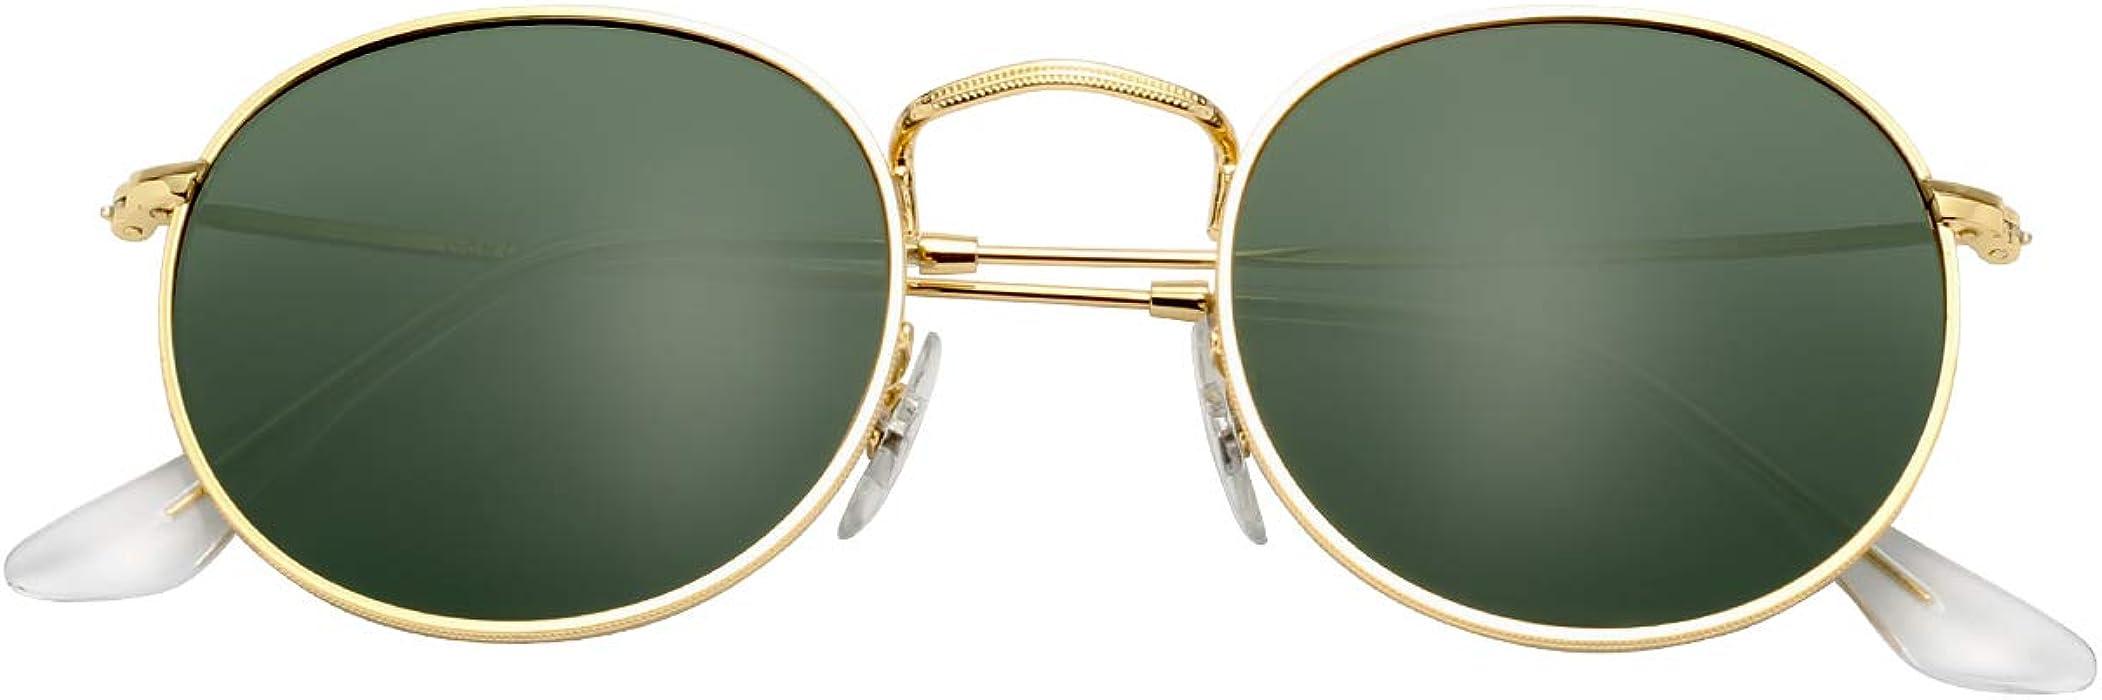 08249b4b62 LianSan Classic Metal Frame Round Circle Mirrored Sunglasses Men Women  Glasses 3447 …